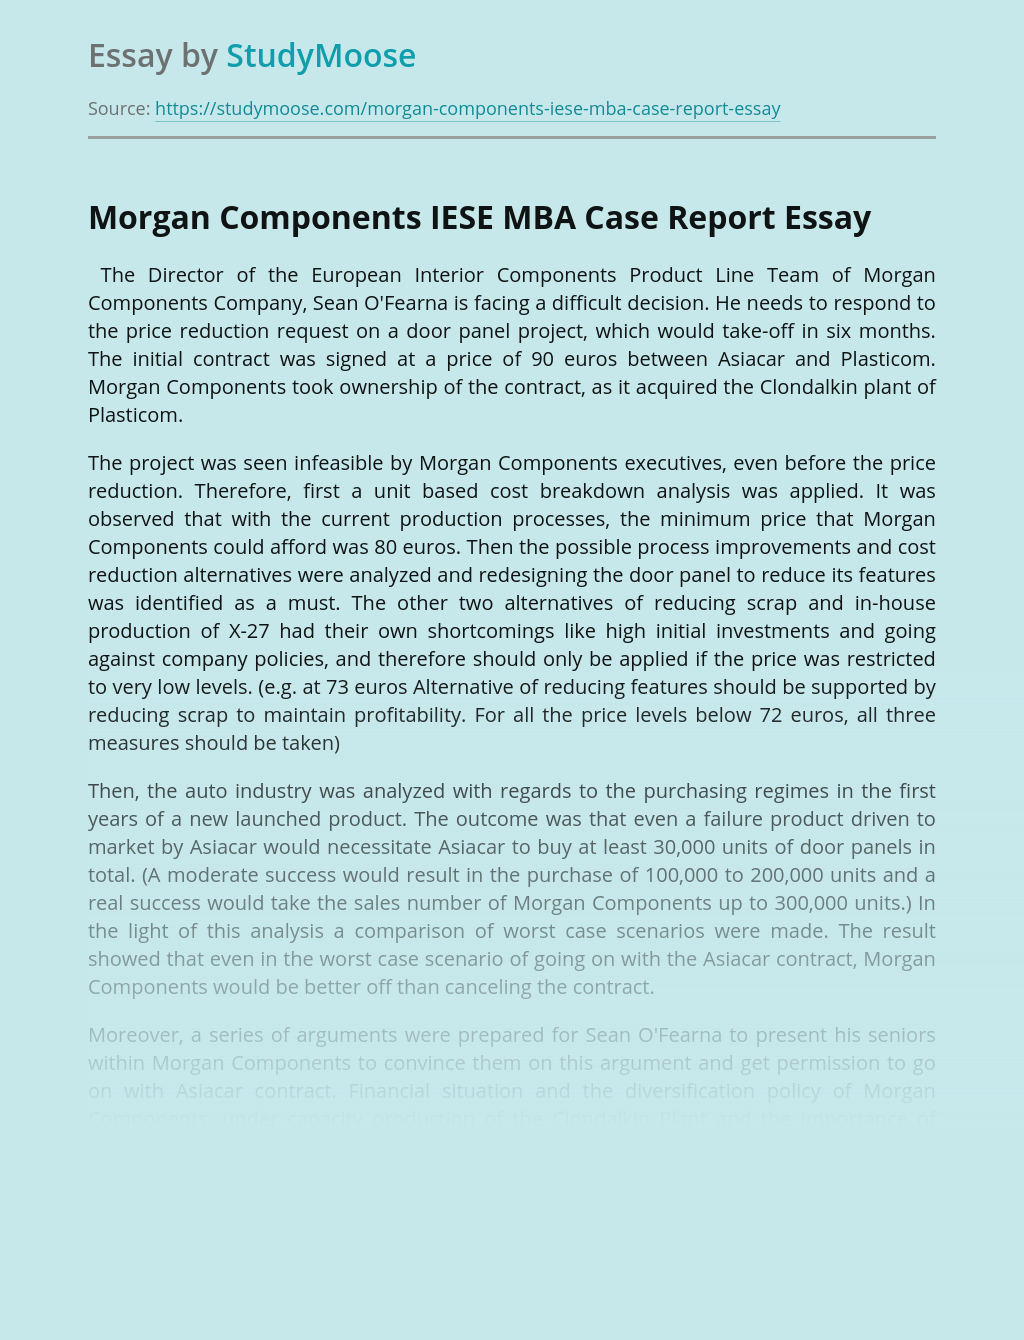 Morgan Components Company's Case